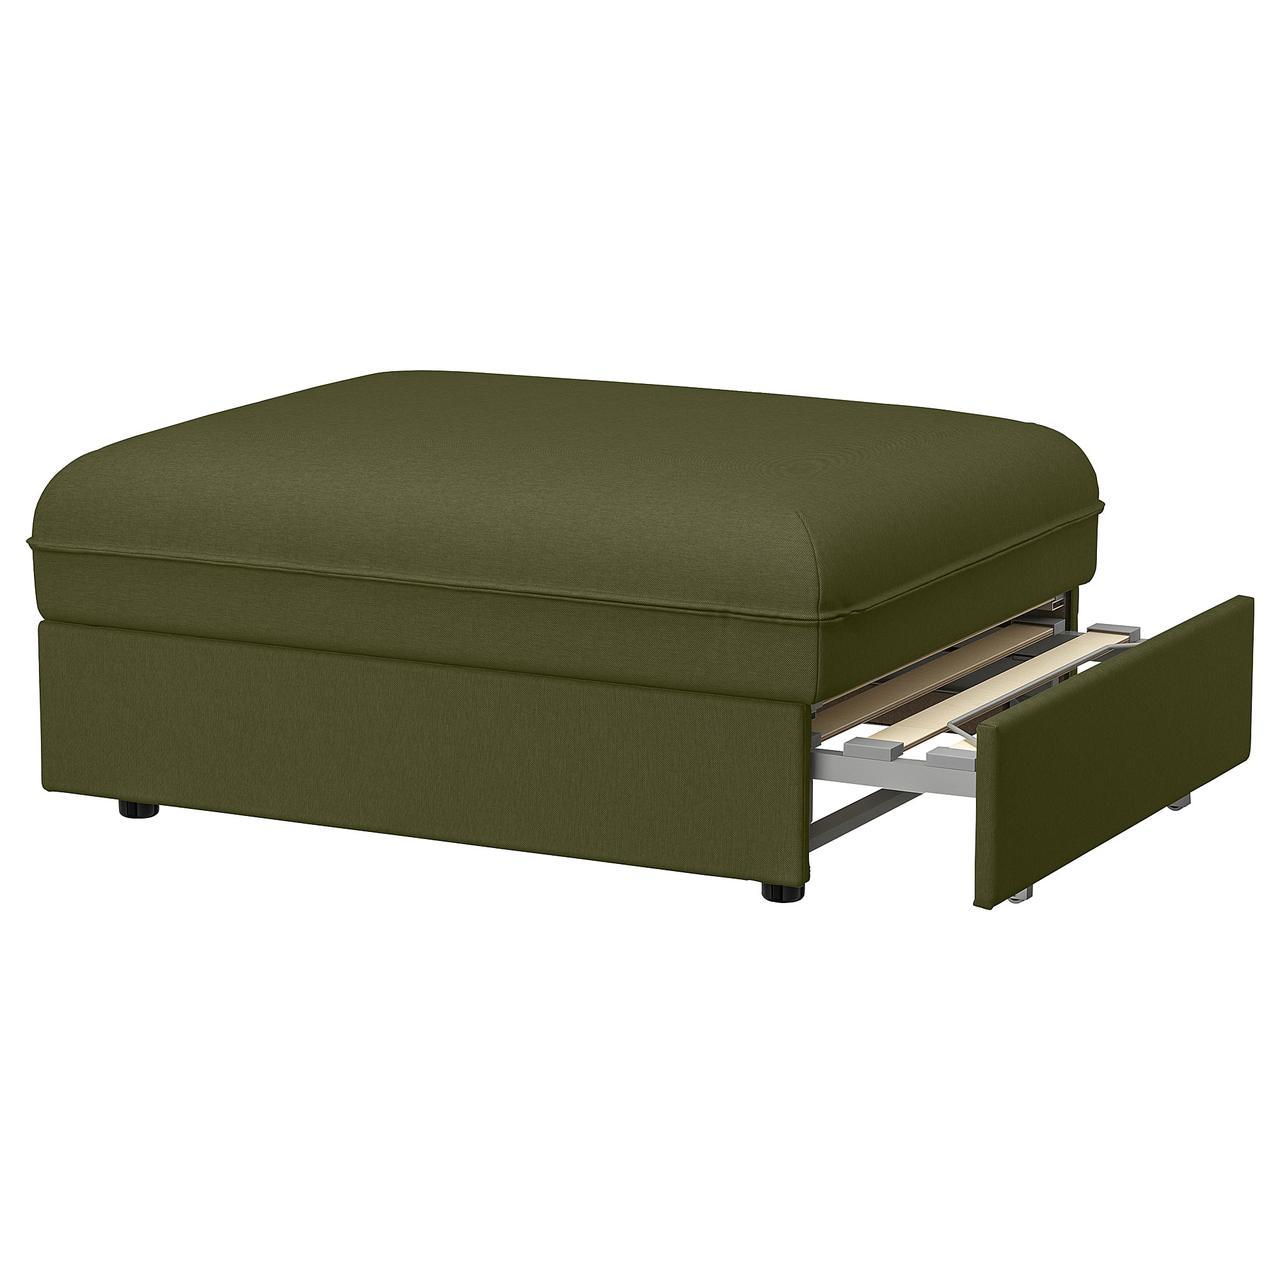 IKEA Модульная система дивана VALLENTUNA ( 692.794.34)